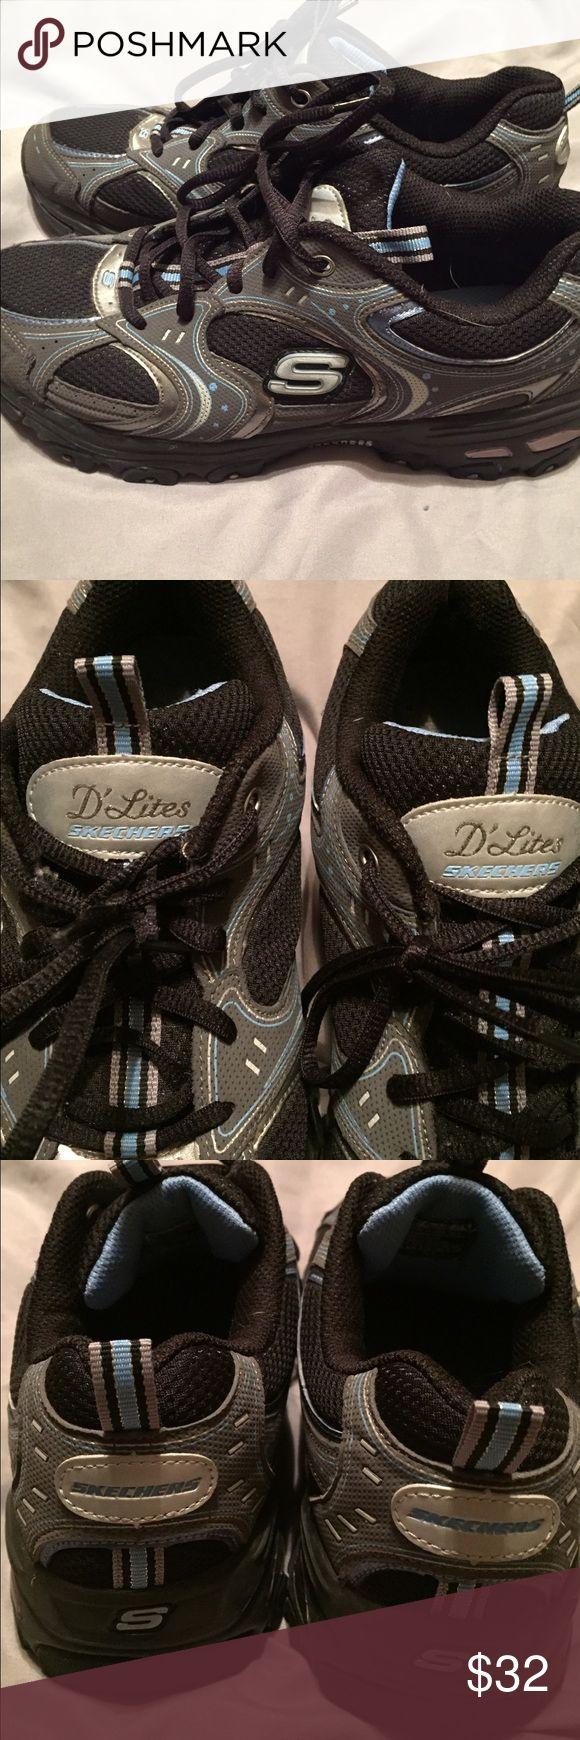 Skechers D'Lites women's 8.5 Skechers D'Lites EUC! Woman's size 8.5. Worn a handful of times. Skechers Shoes Athletic Shoes